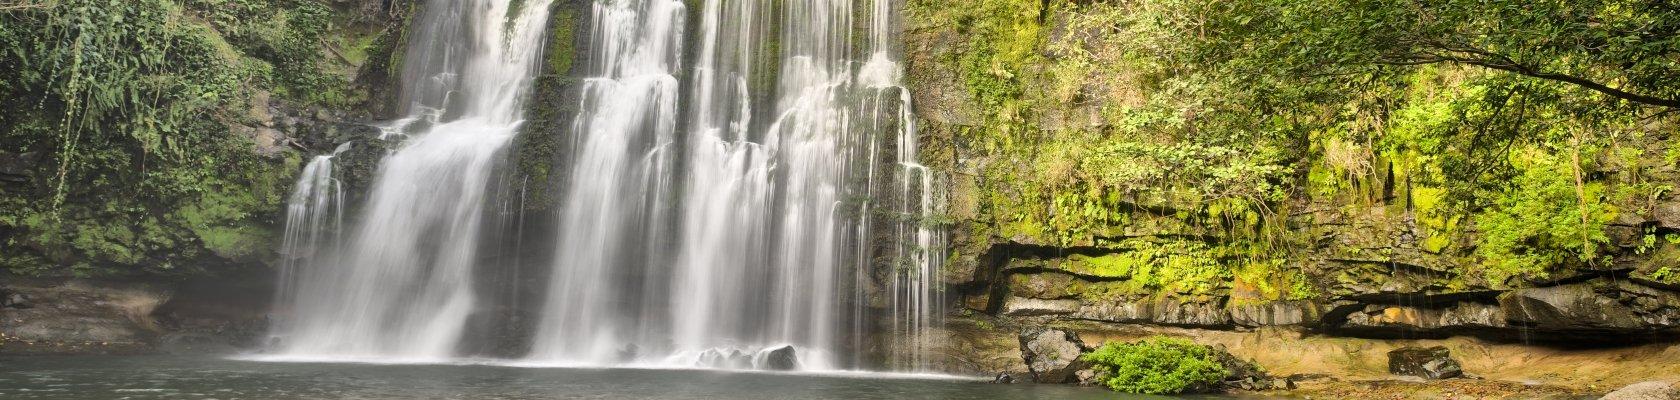 Llanos de Cortés waterval